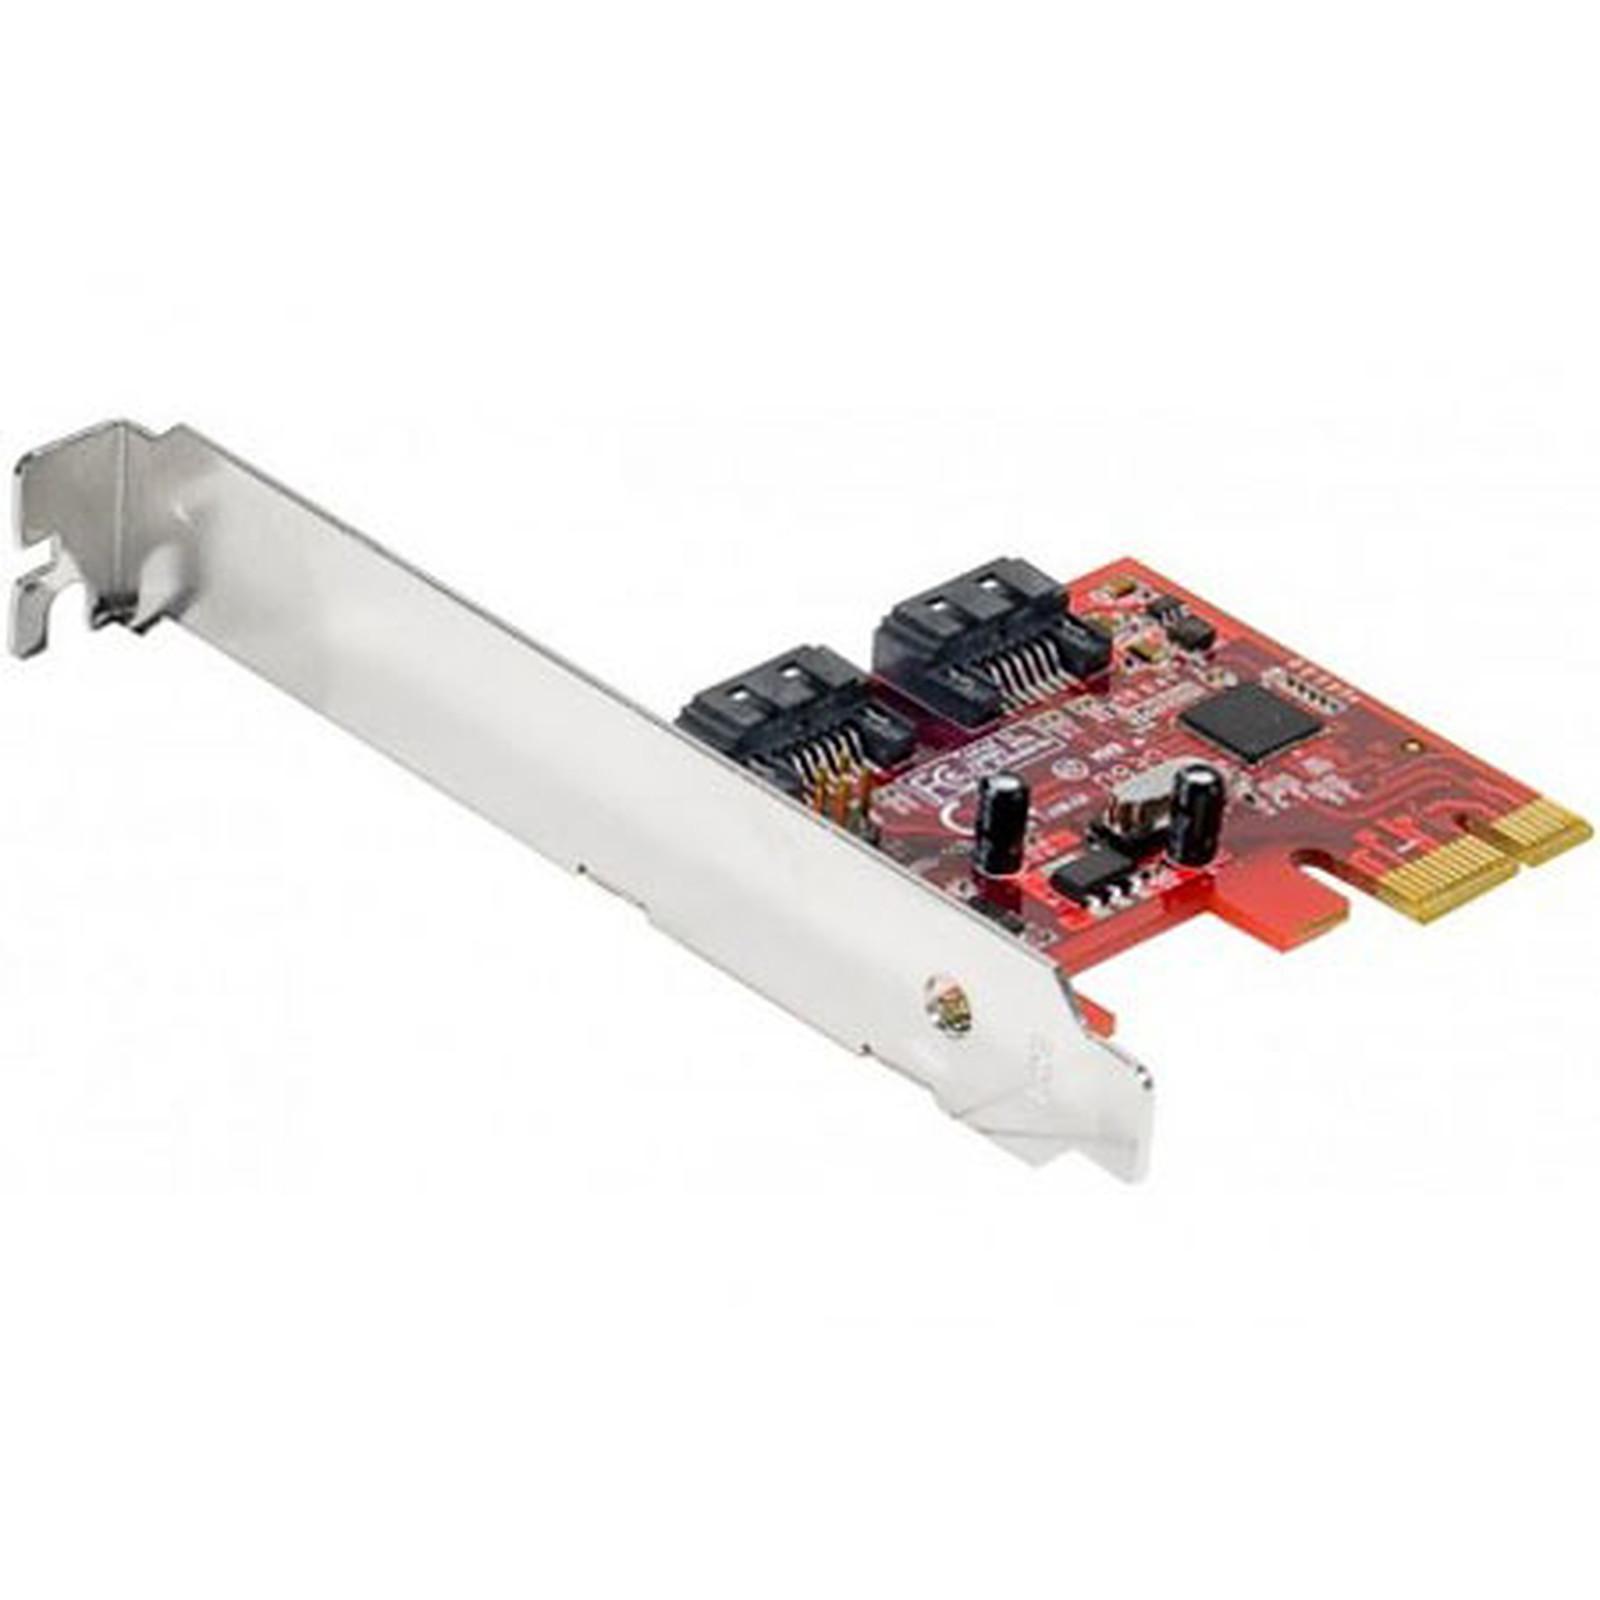 Carte contrôleur PCI-Express 2 ports SATA III Internes 6Gbps